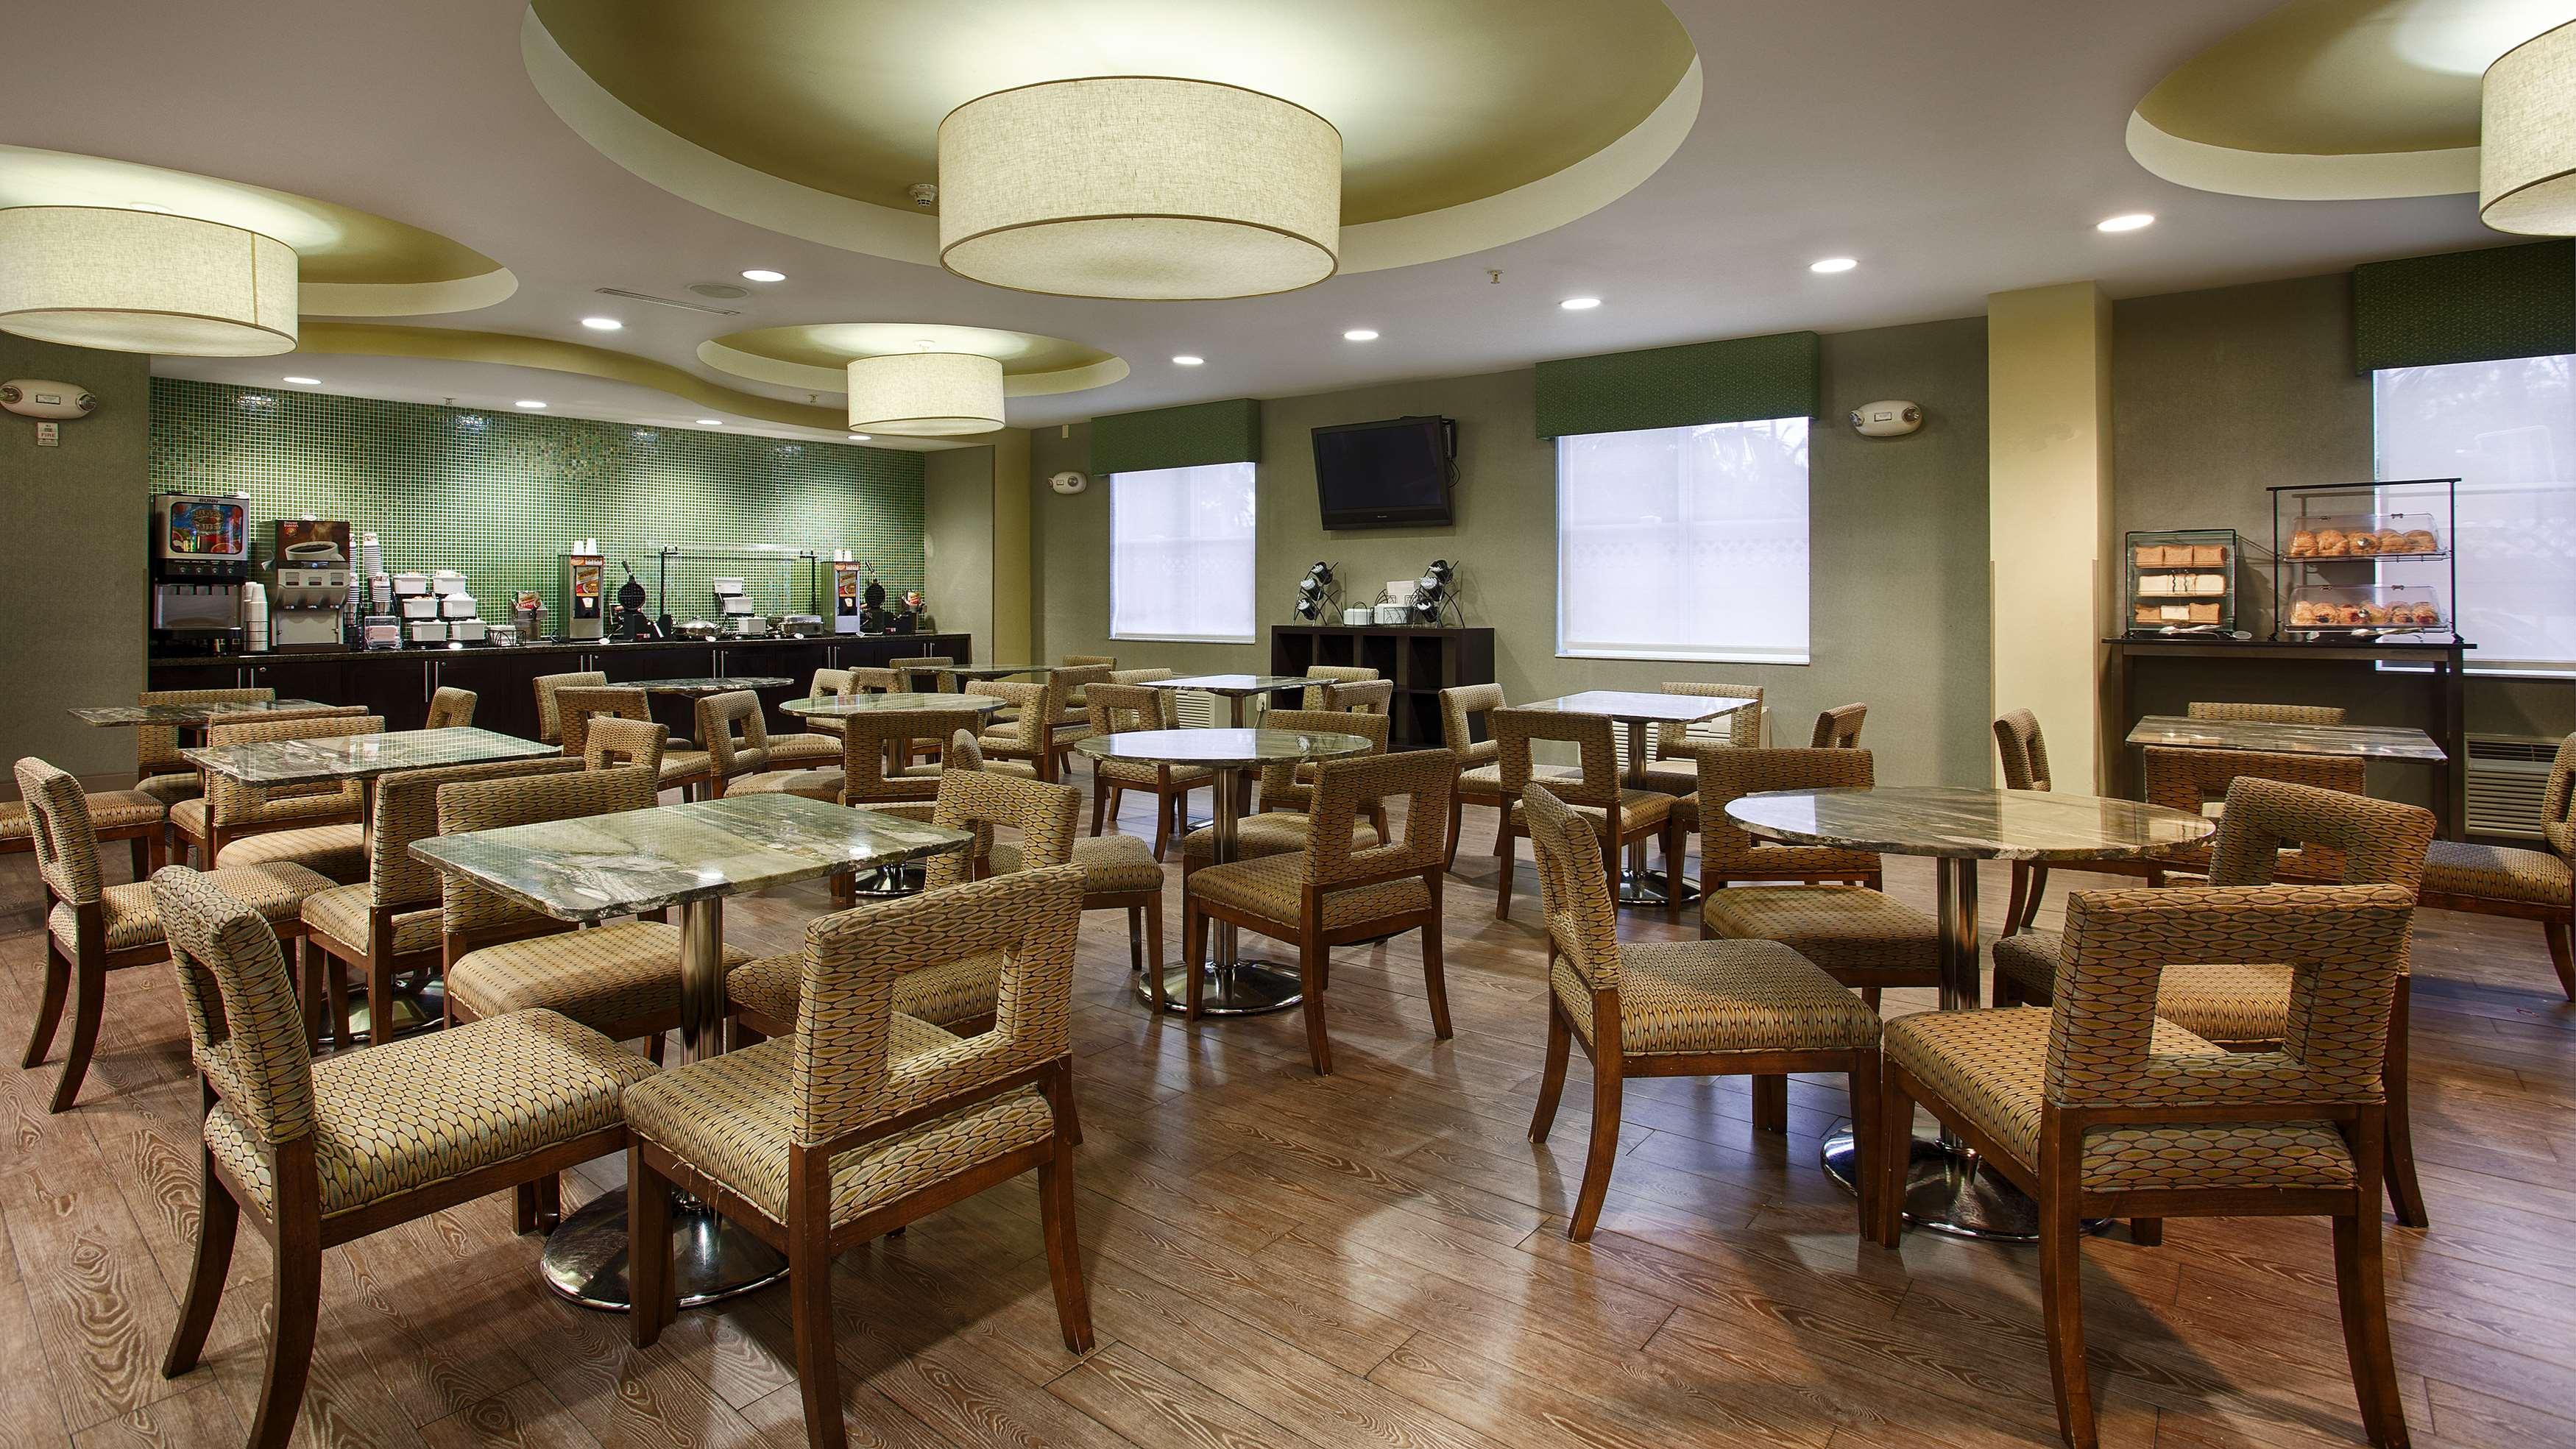 Best Western Plus Fort Lauderdale Airport South Inn & Suites image 9